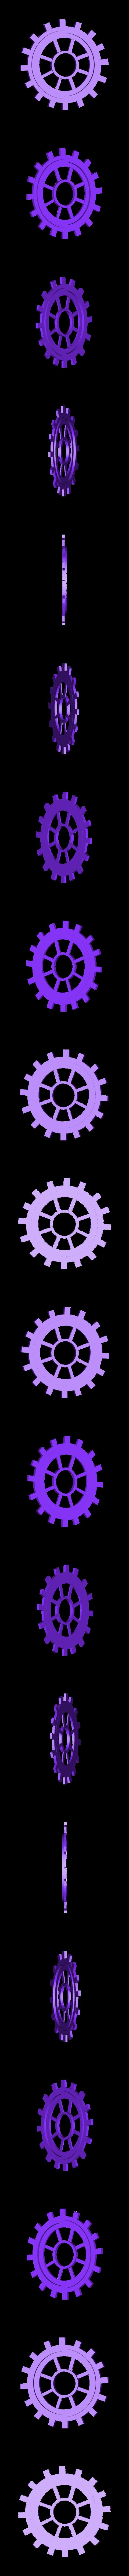 moyen engrenage modif.stl Download STL file gear decoration • 3D printer template, catf3d